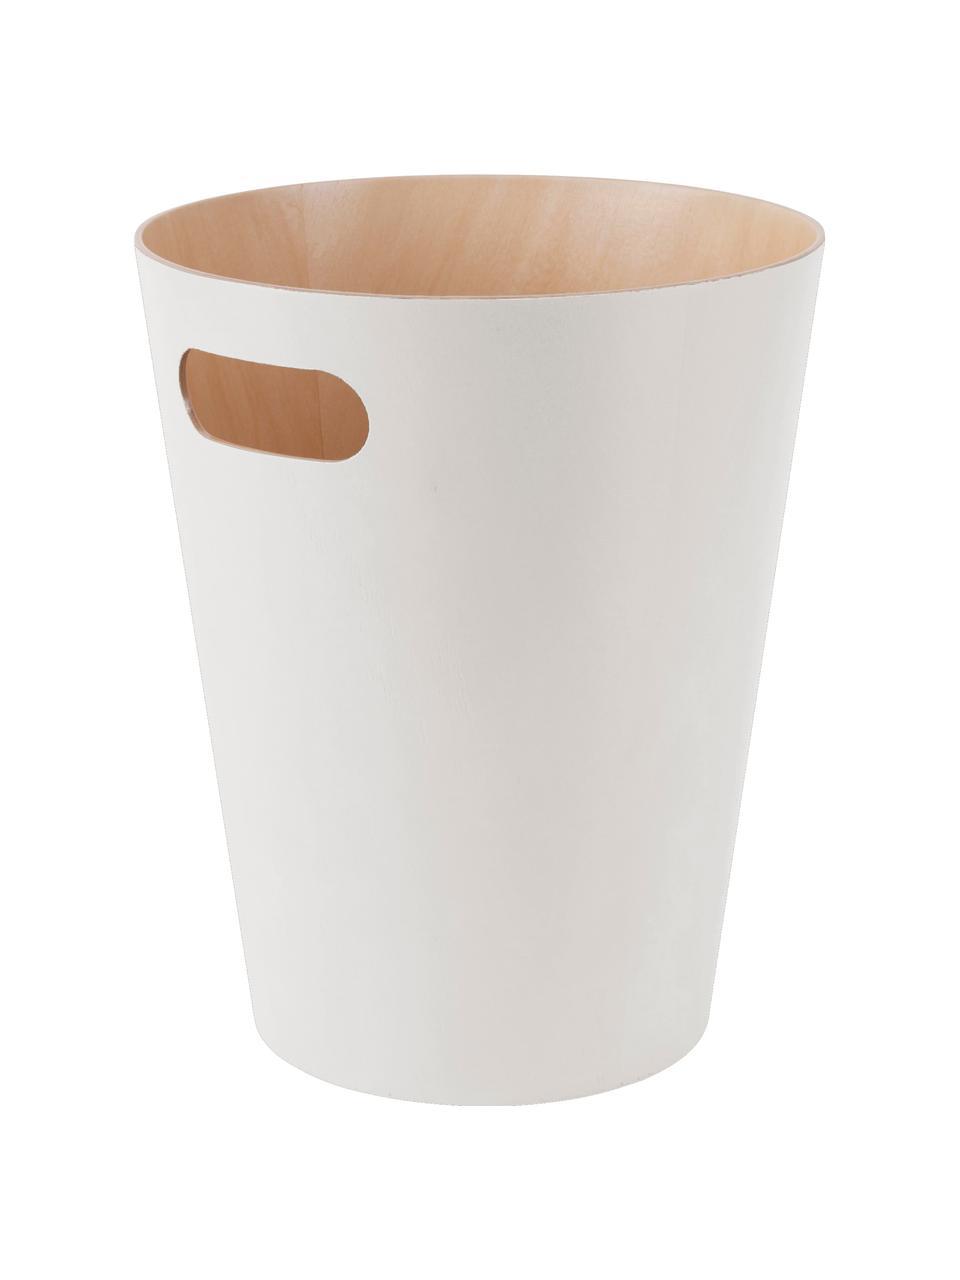 XS Papierkorb Woodrow Can, Holz, lackiert, Creme, Ø 23 x H 28 cm